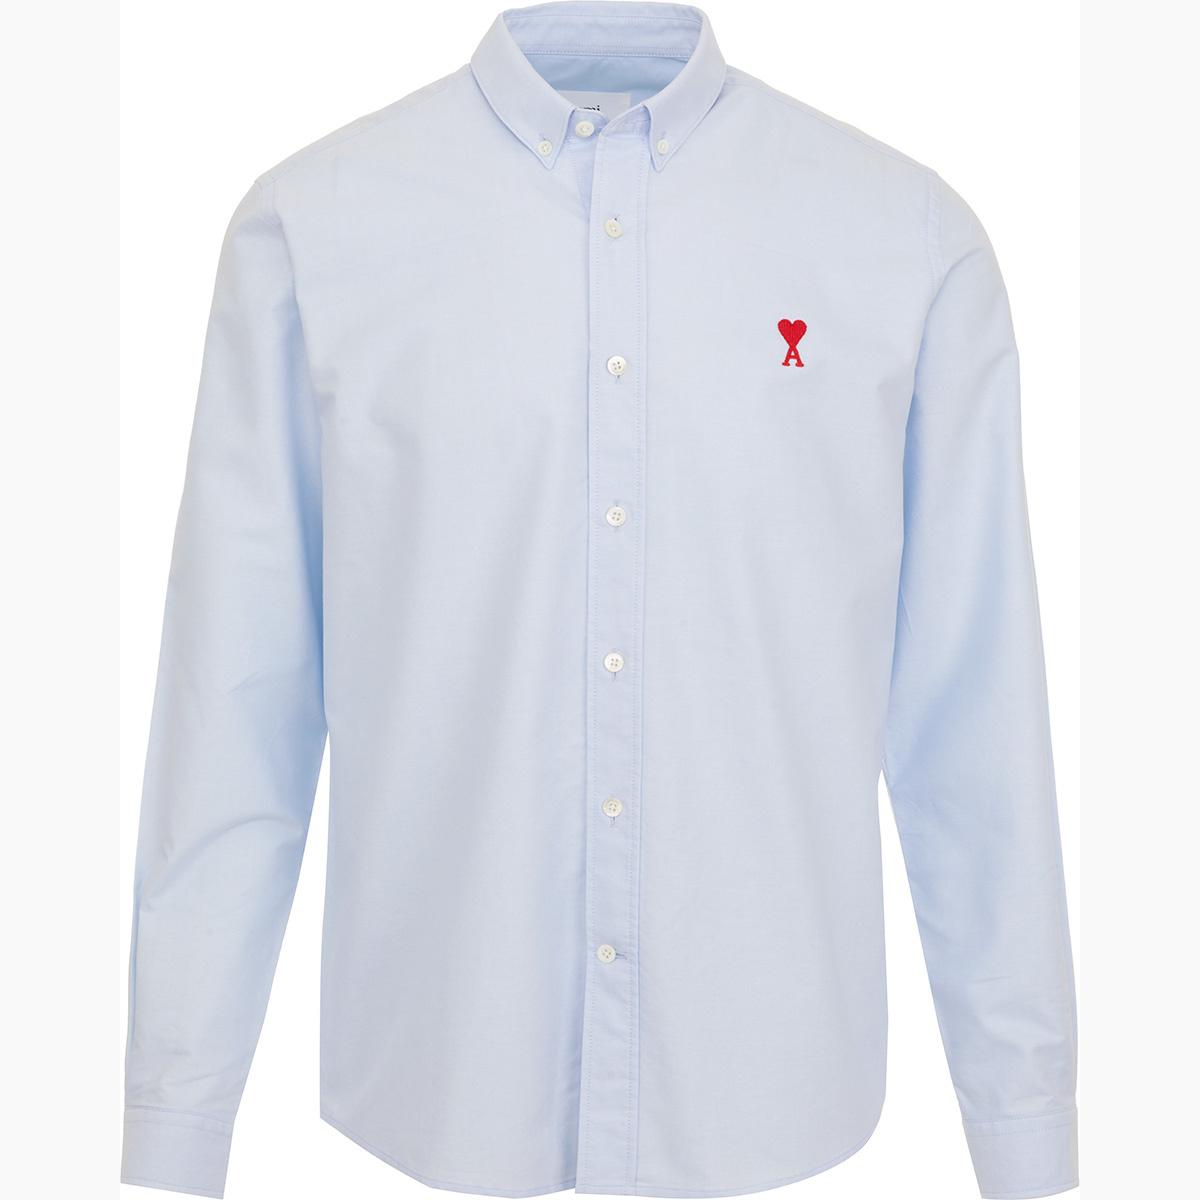 button-down adc shirt